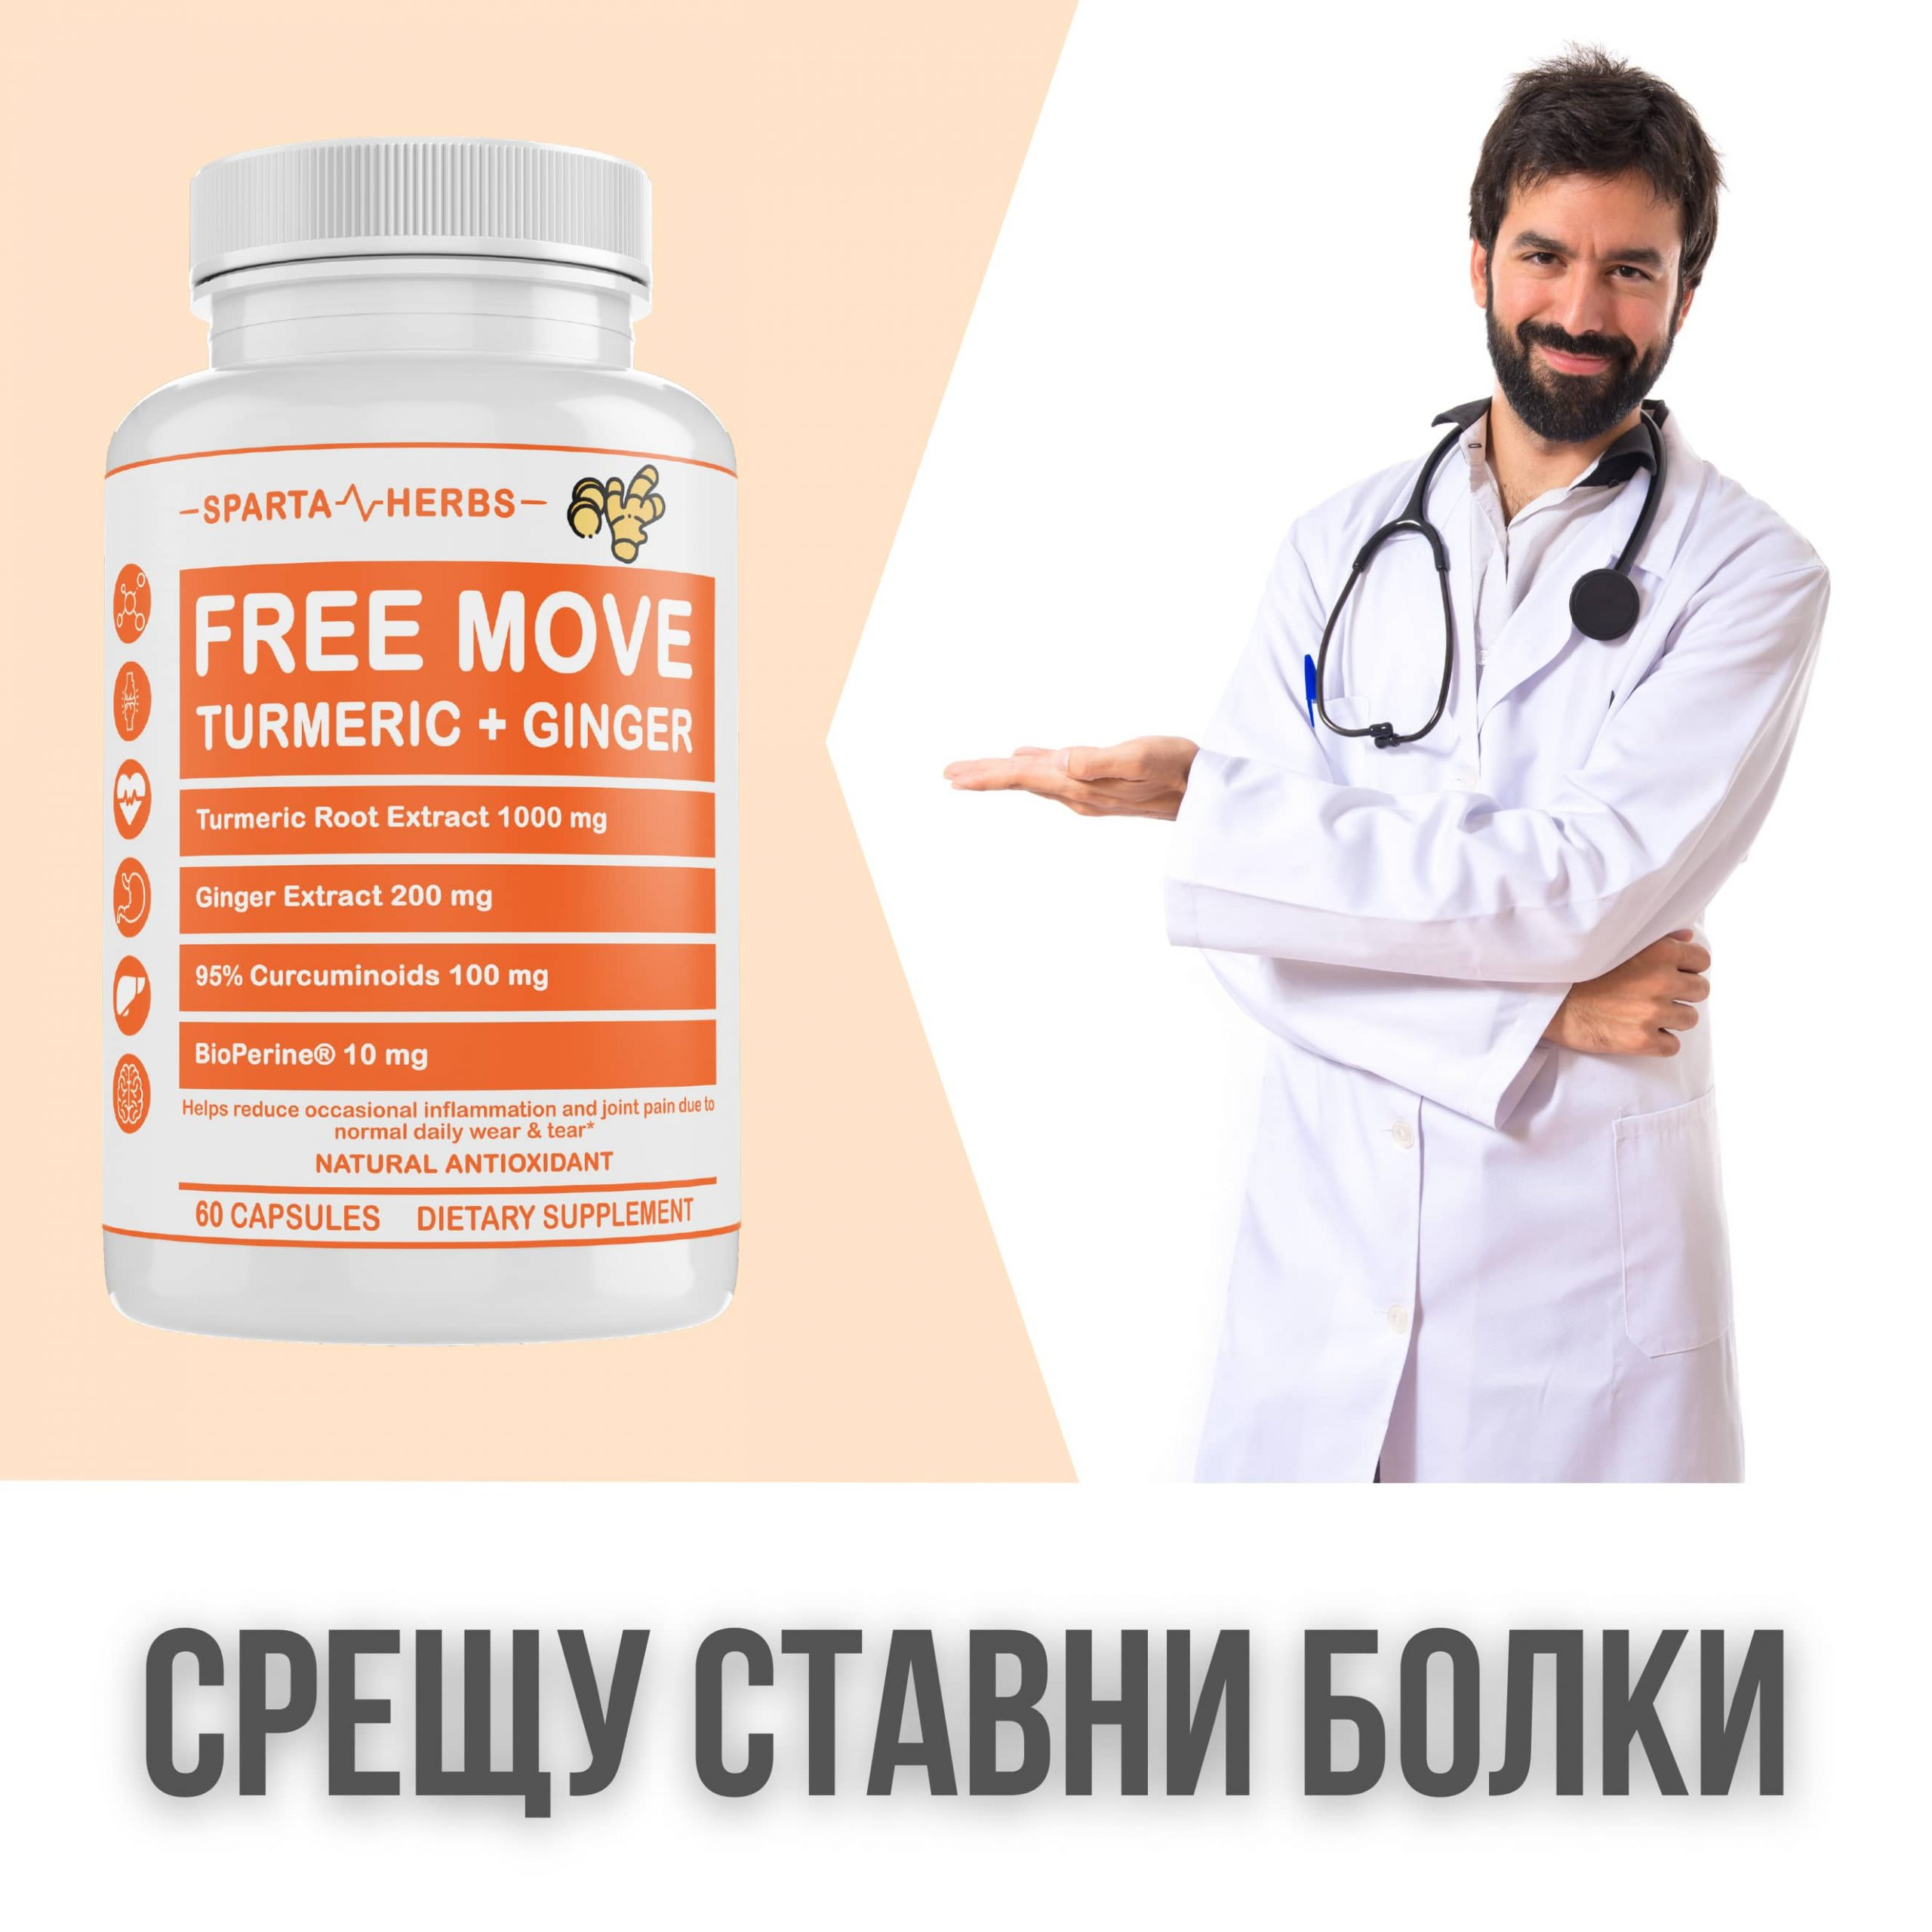 FREE MOVE